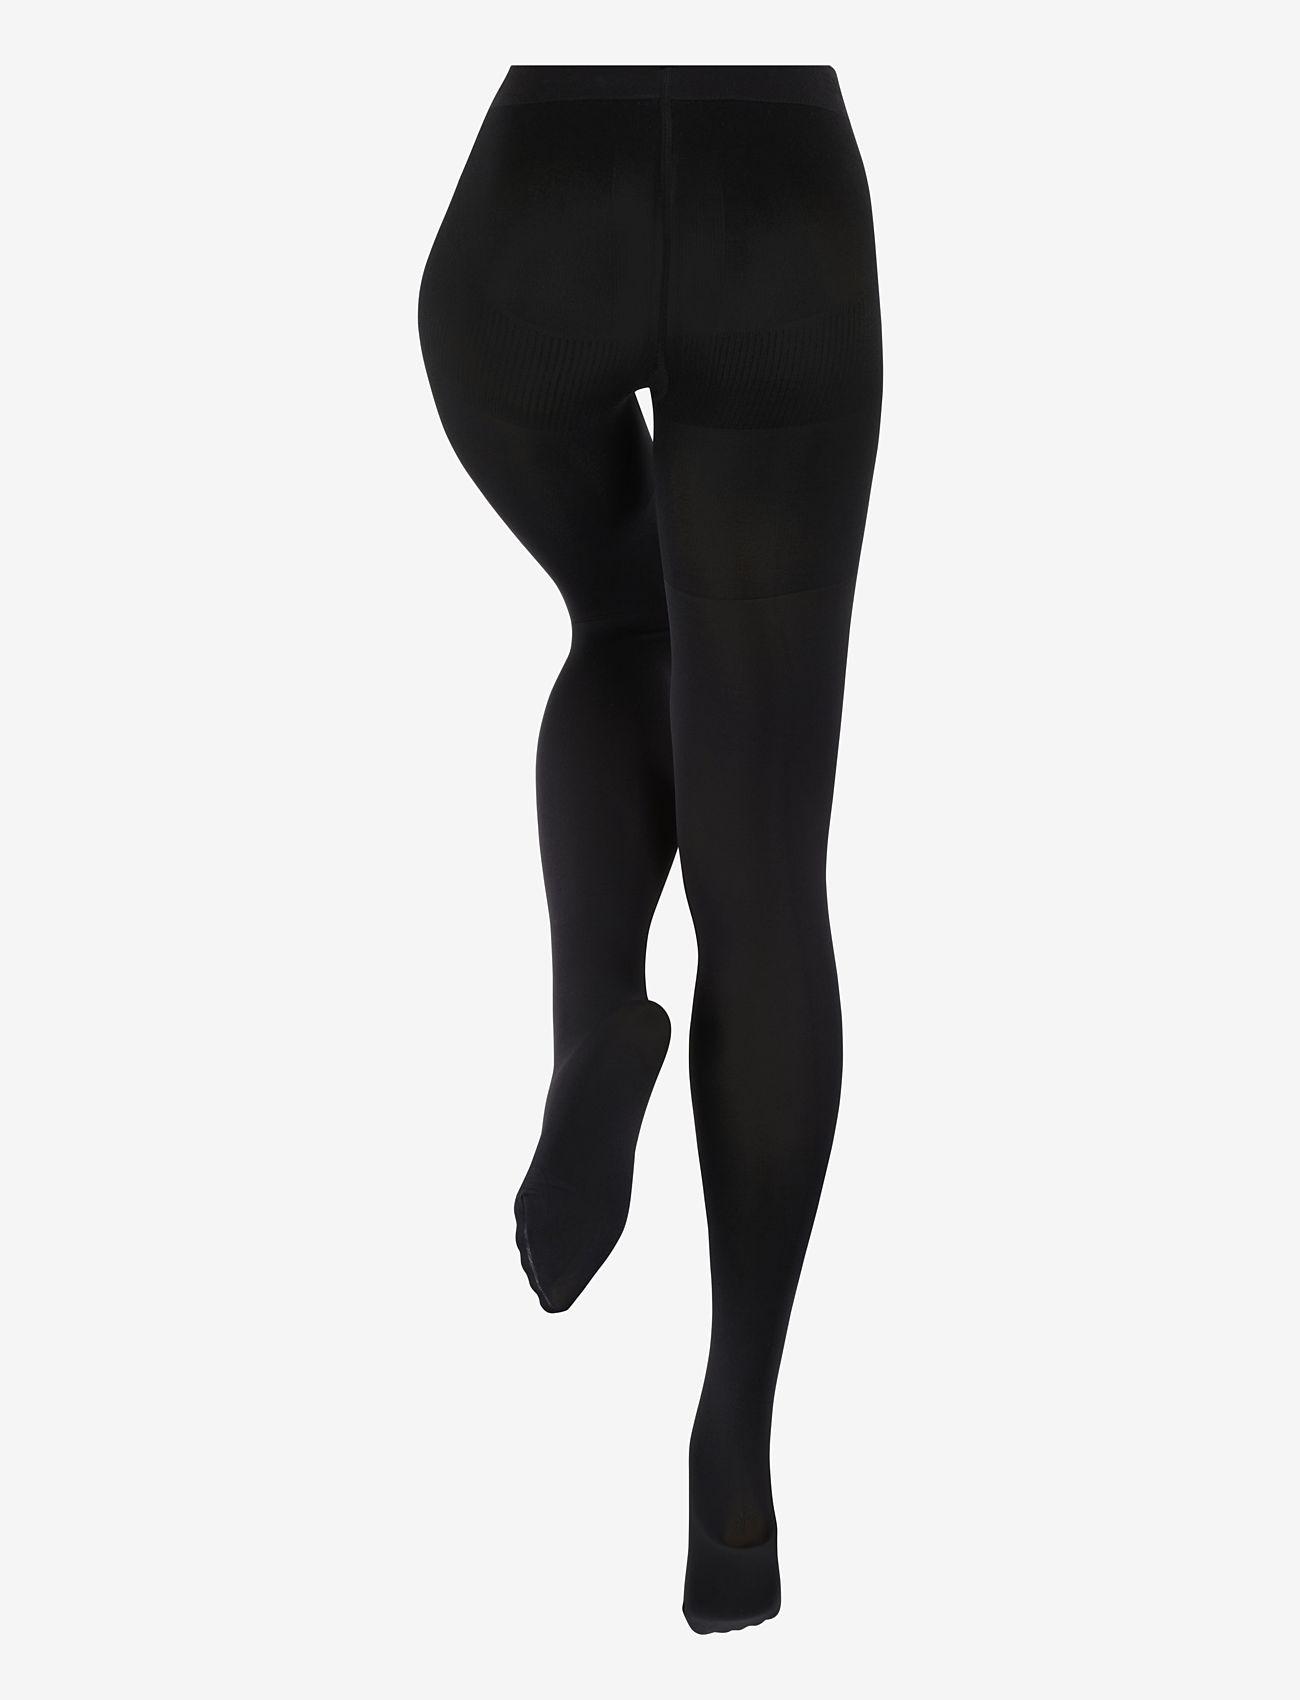 Esprit Socks - Shaping 80 TI - collants - black - 1